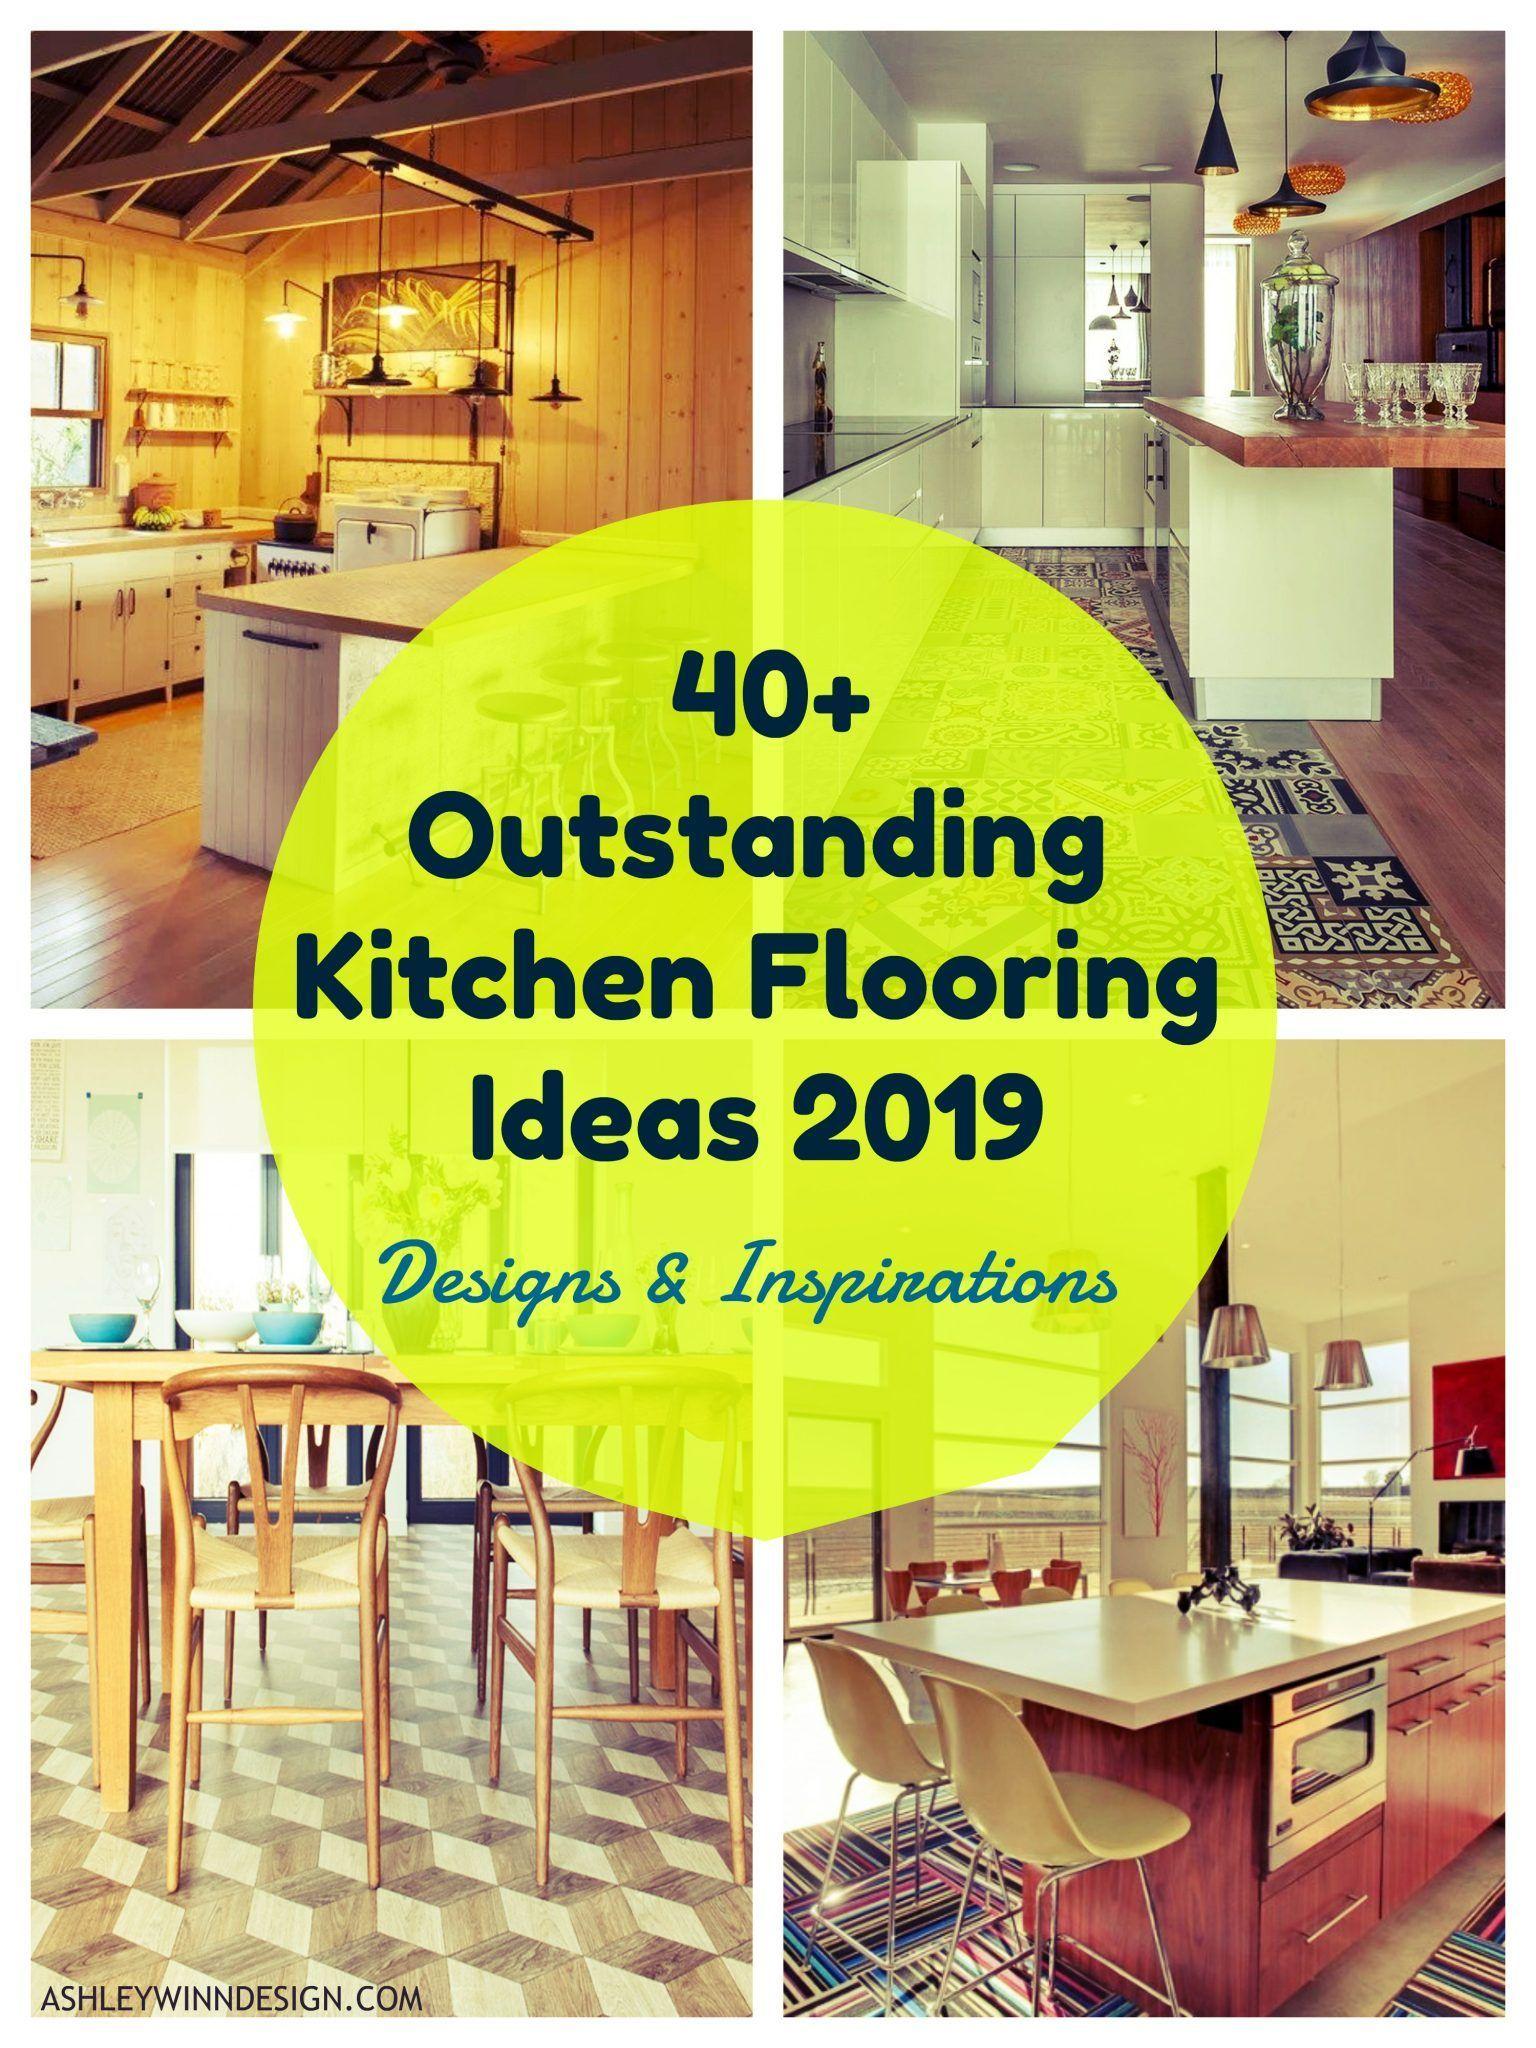 Flooring Ideas Inspirations Kitchen